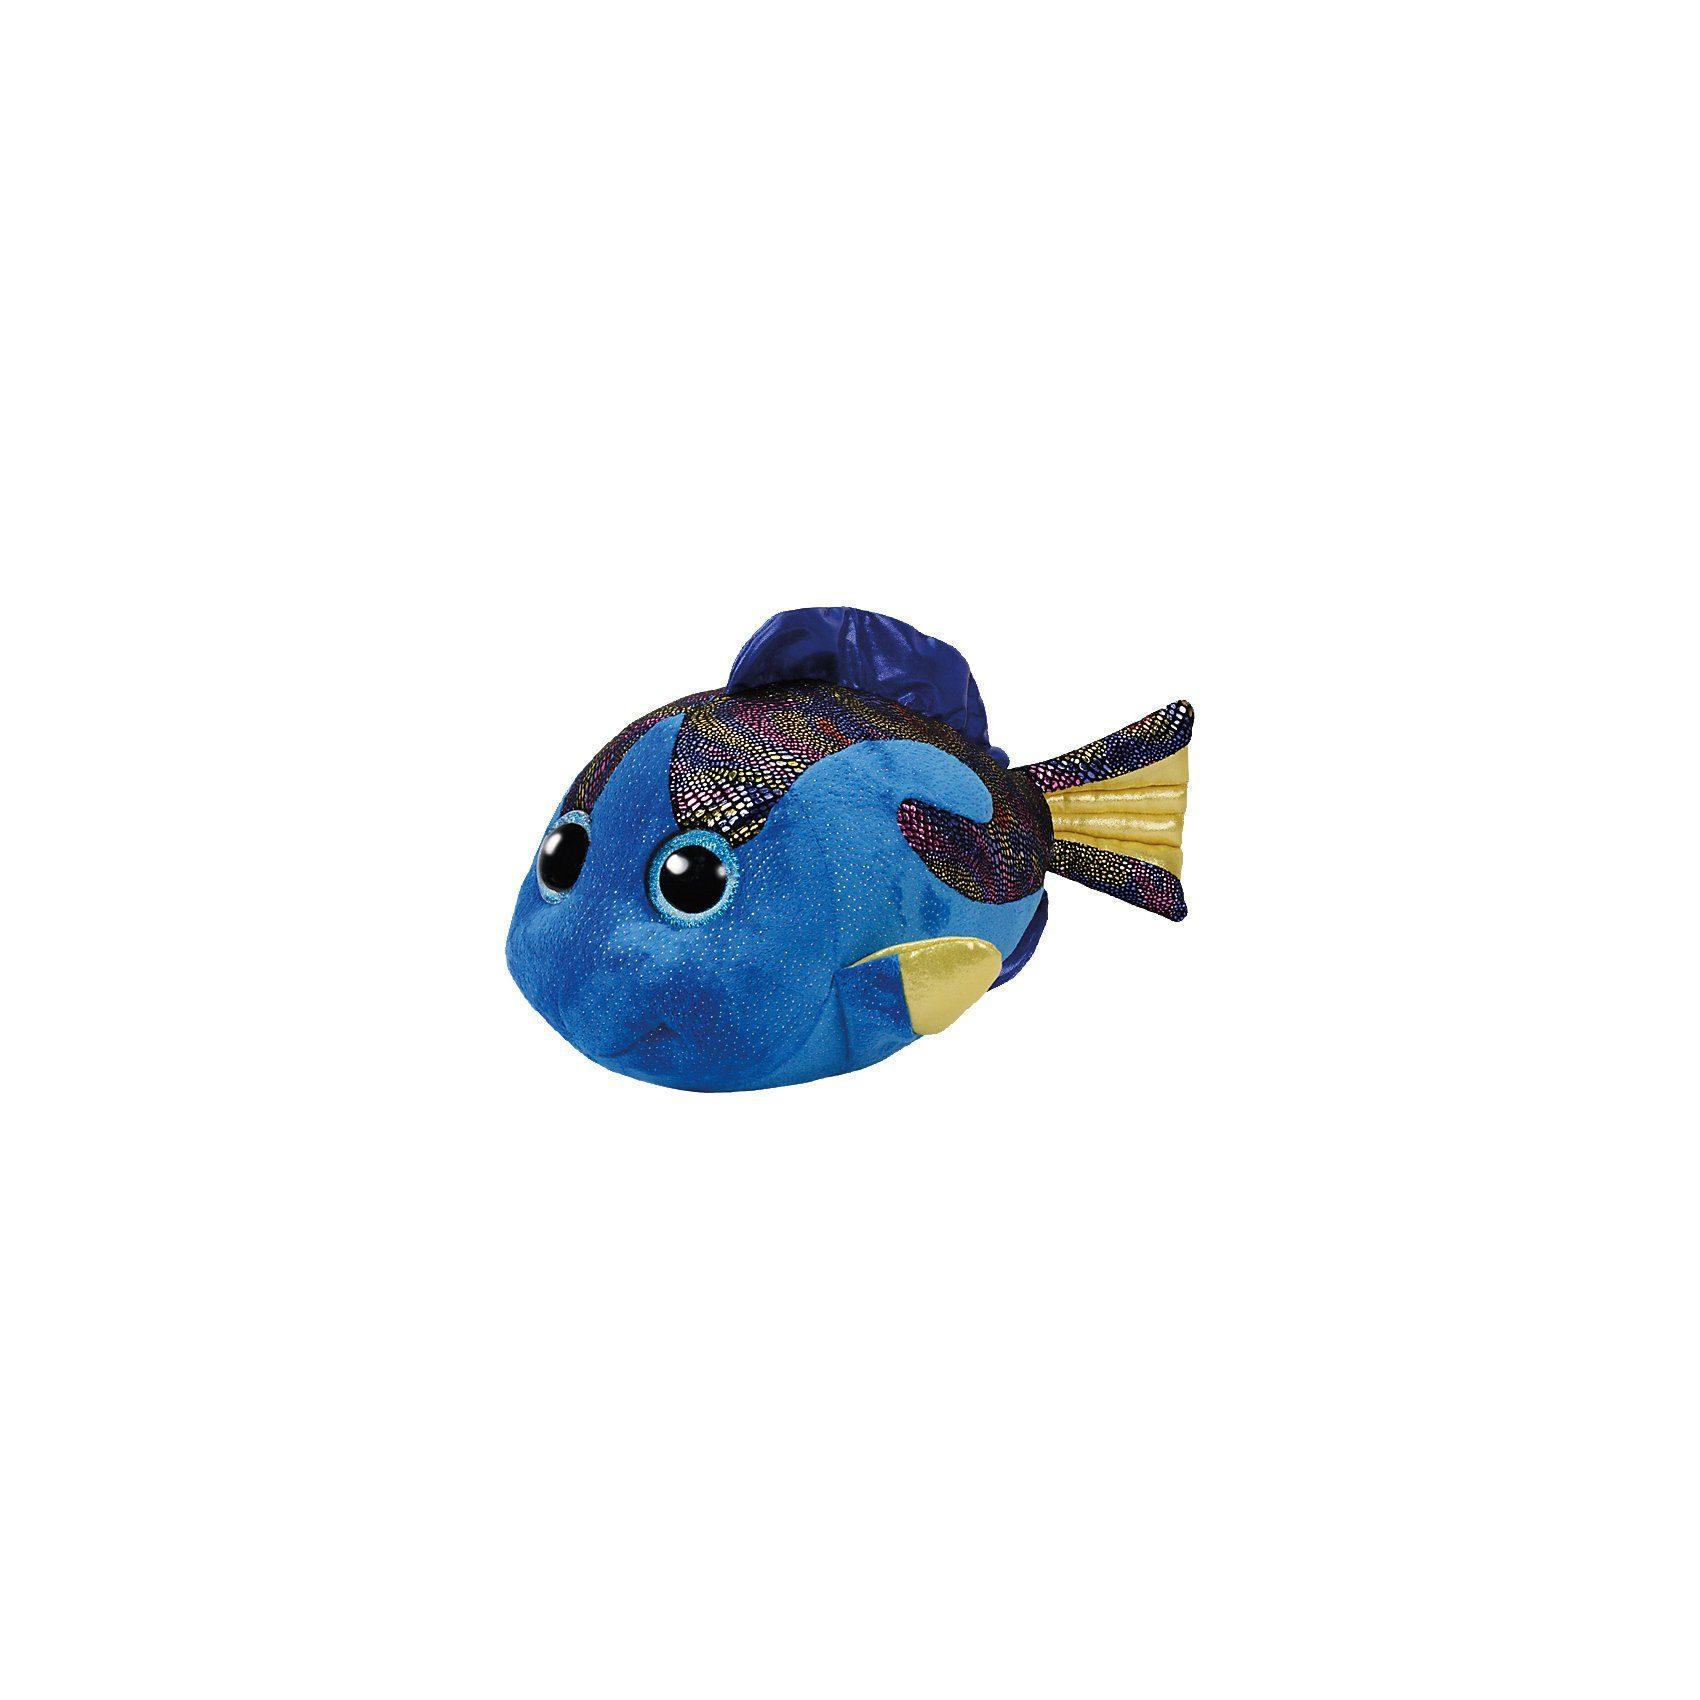 Ty Fisch Aqua blau, 42 cm